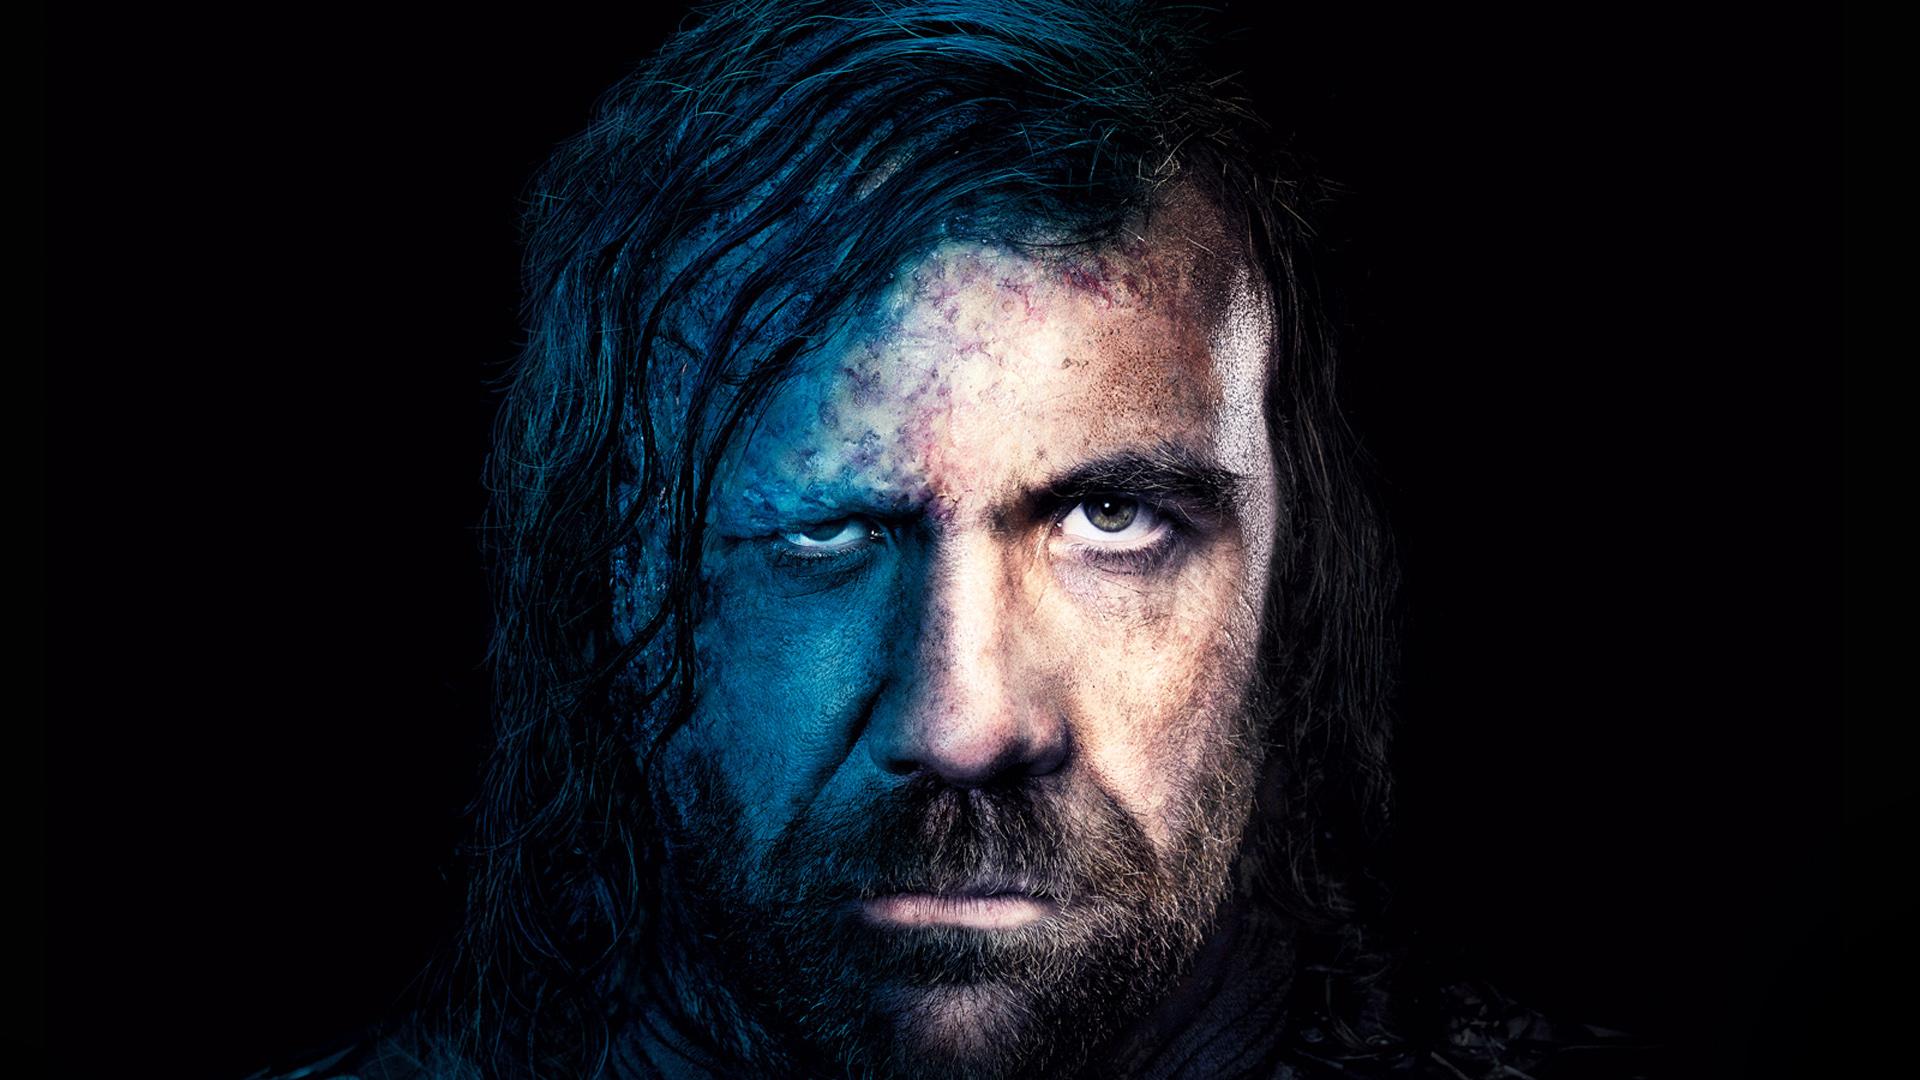 Download Game of Thrones Sandor Clegane Character HD Wallpaper Wide 1920x1080